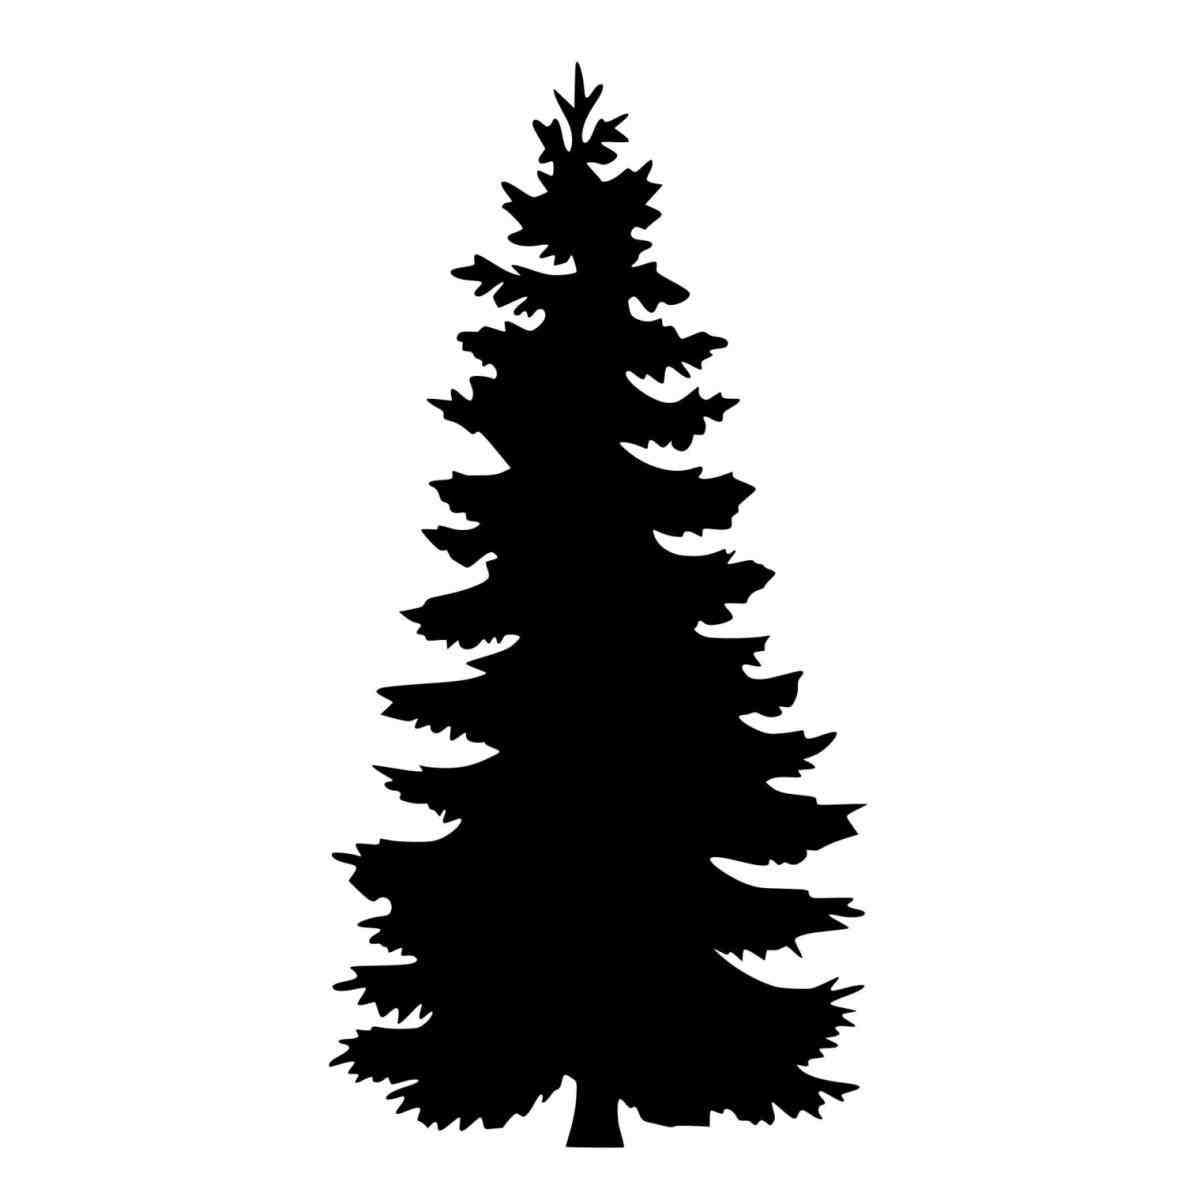 1185x1185 Pine Tree Silhouette Clip Art